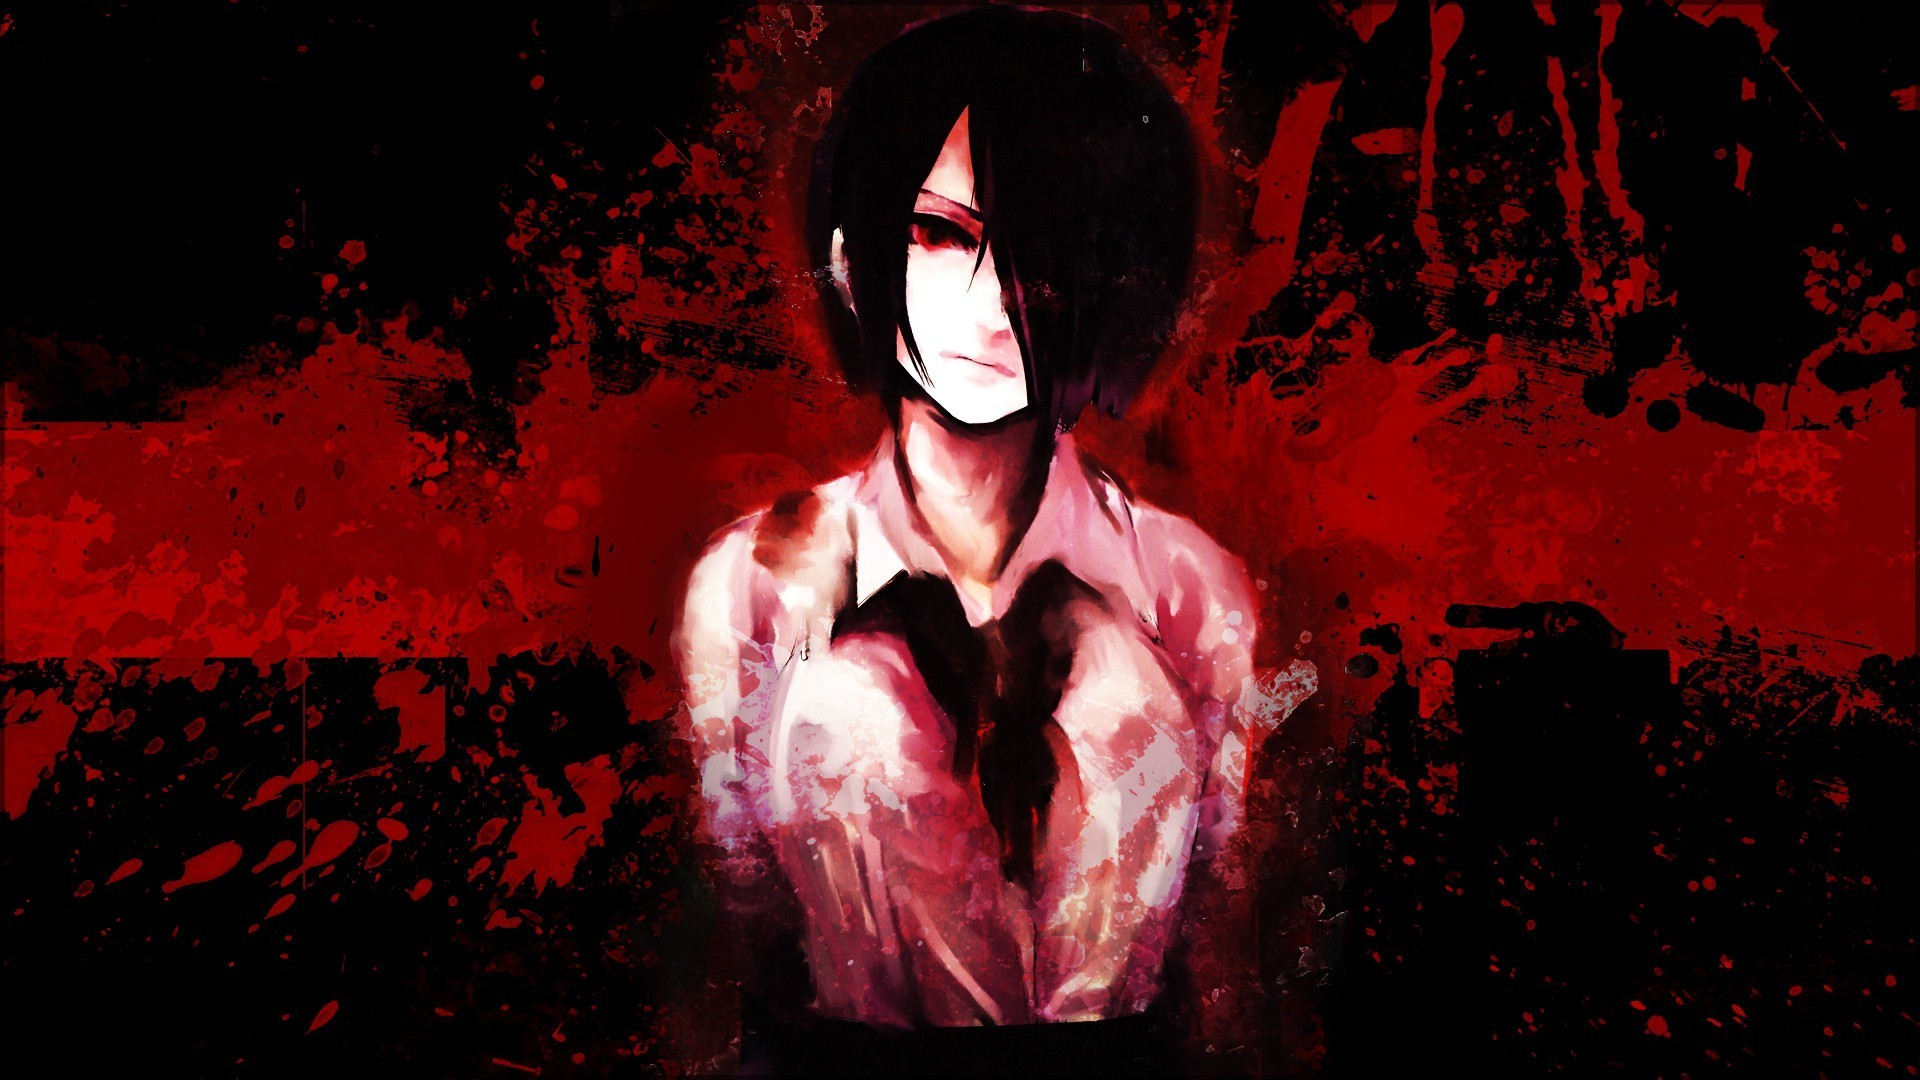 Tokyo Ghoul, Touka Kirishima Wallpapers HD / Desktop and Mobile Backgrounds